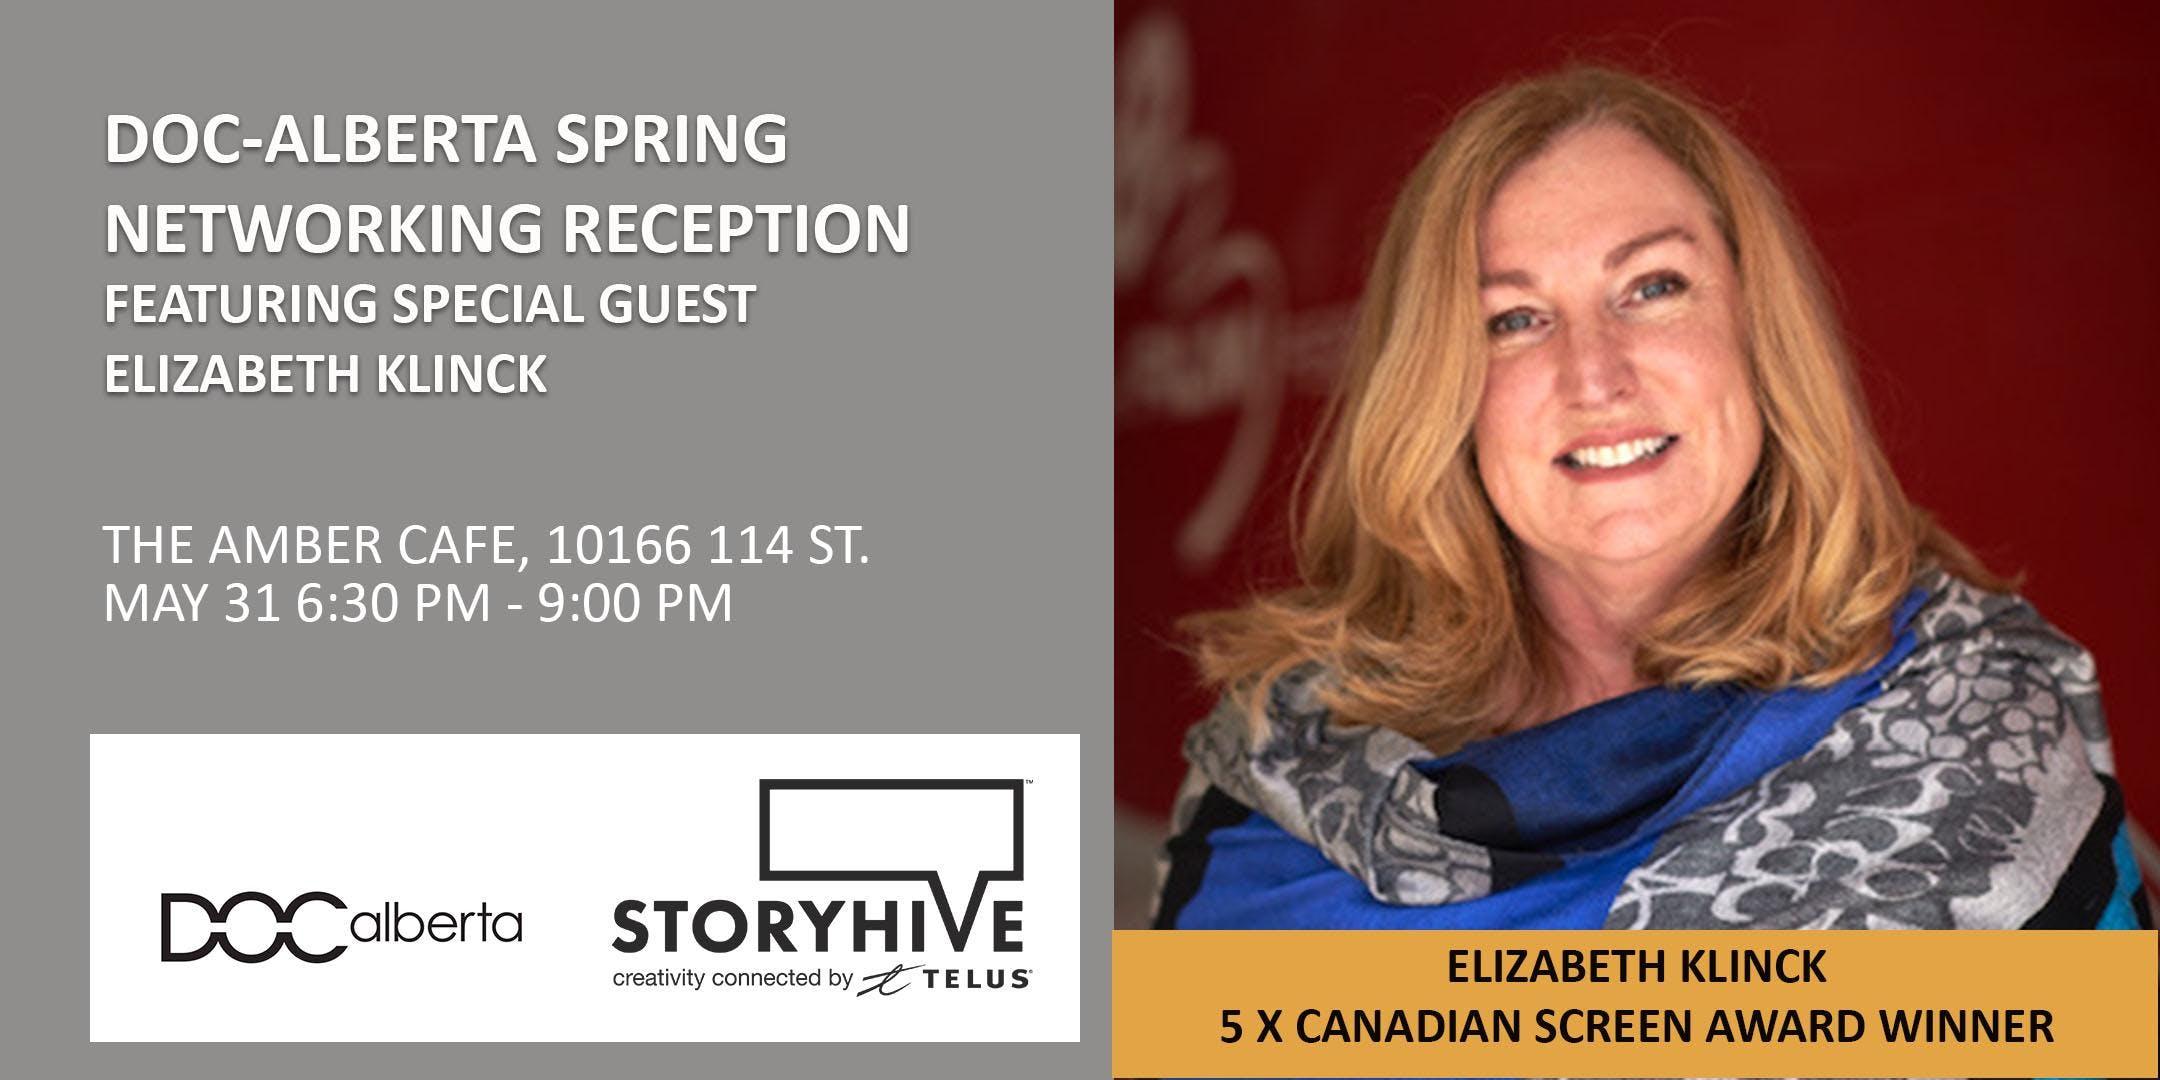 DOC-Alberta Spring Networking Reception